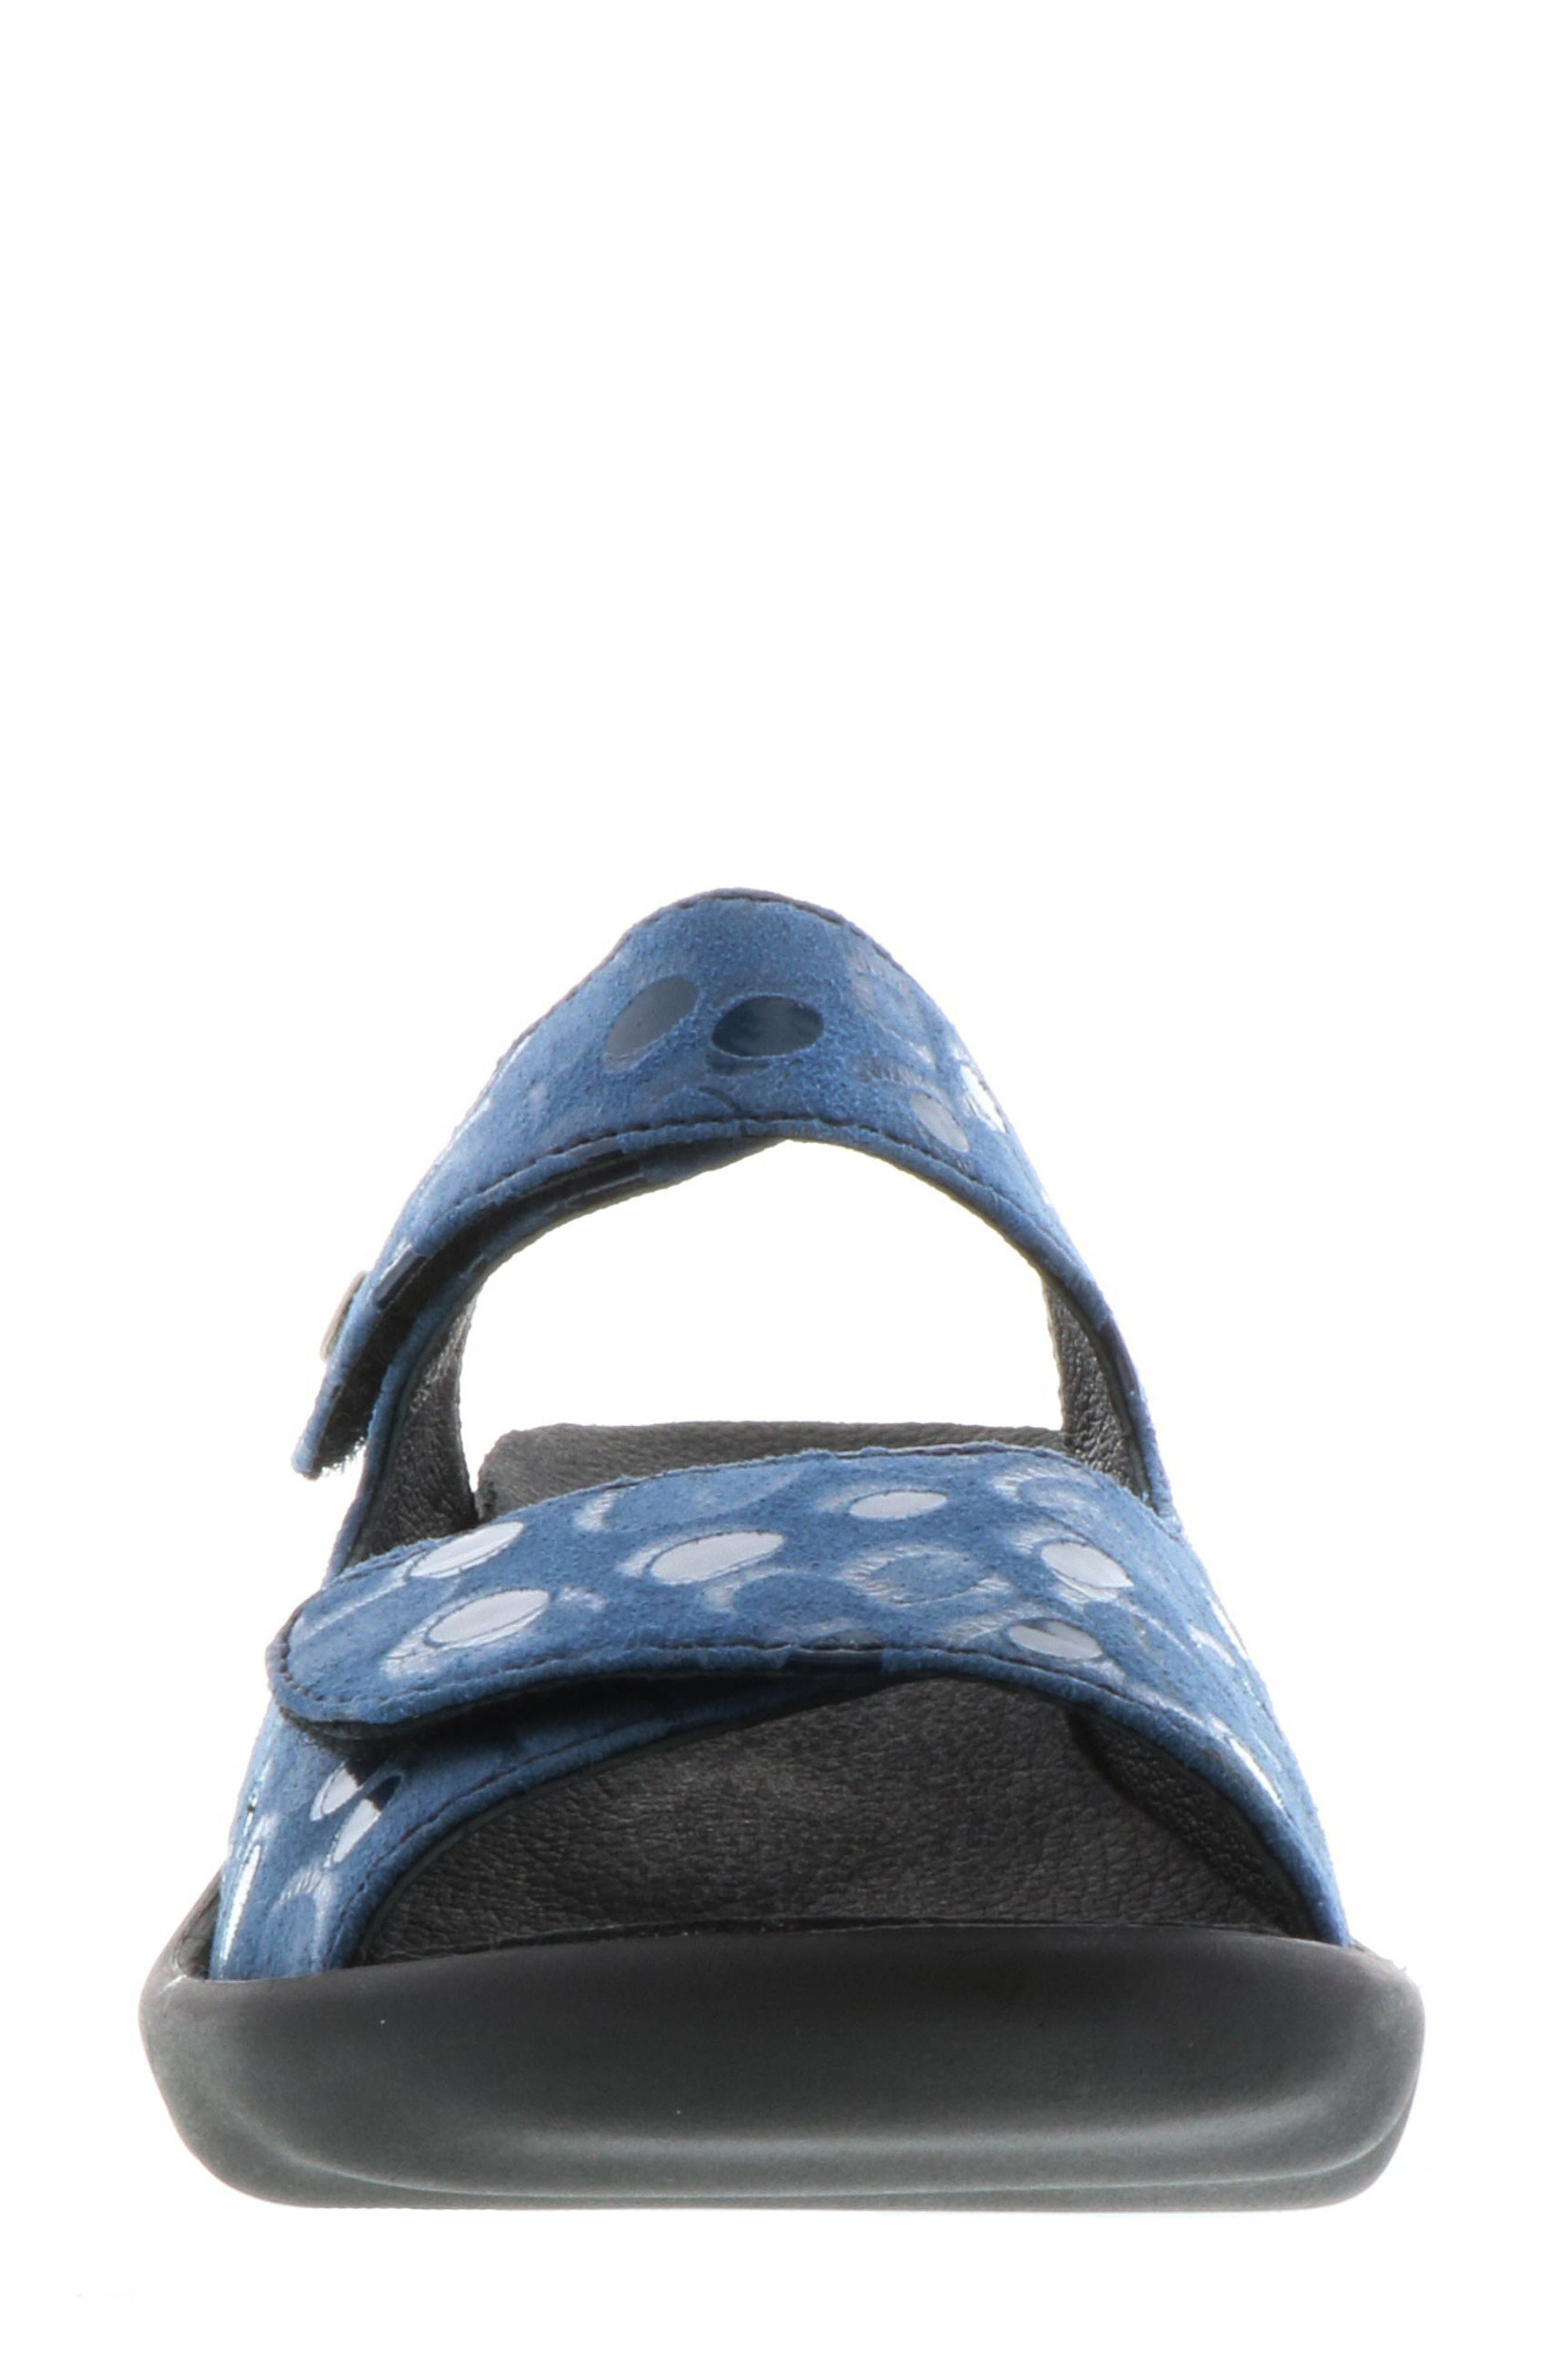 Bolena Slide Sandal,                             Alternate thumbnail 4, color,                             Blue Circle Print